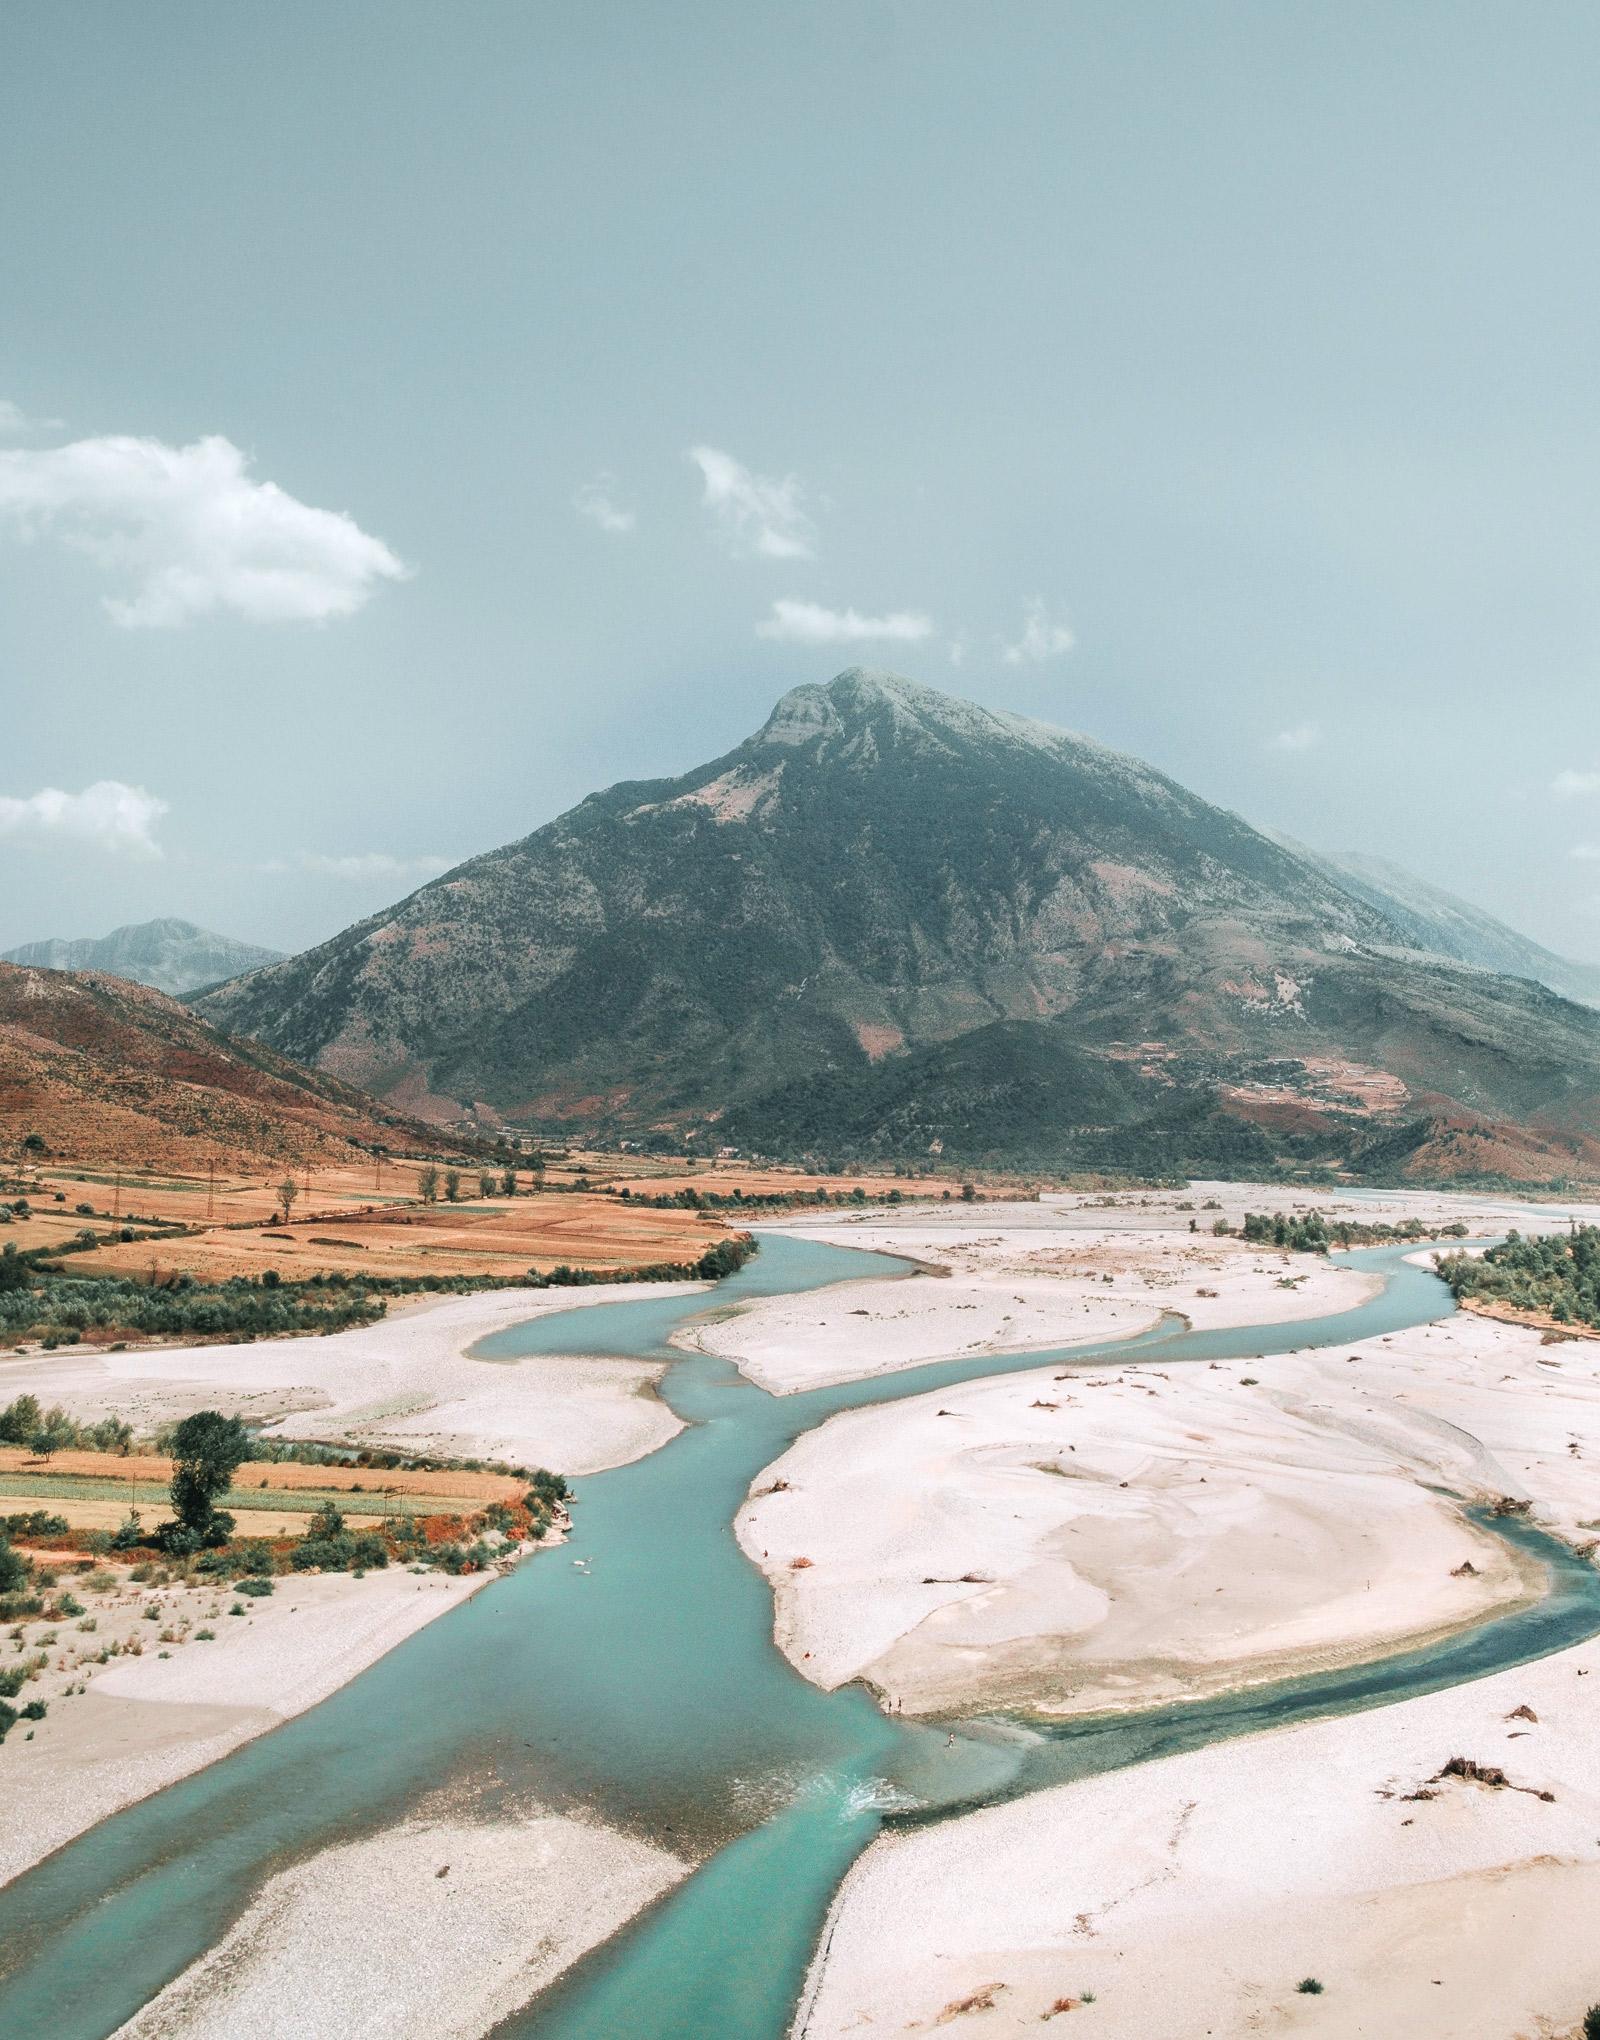 Wilde, unberührte Flüsse im Balkan. Hier sieht man den Fluss Vjosa.